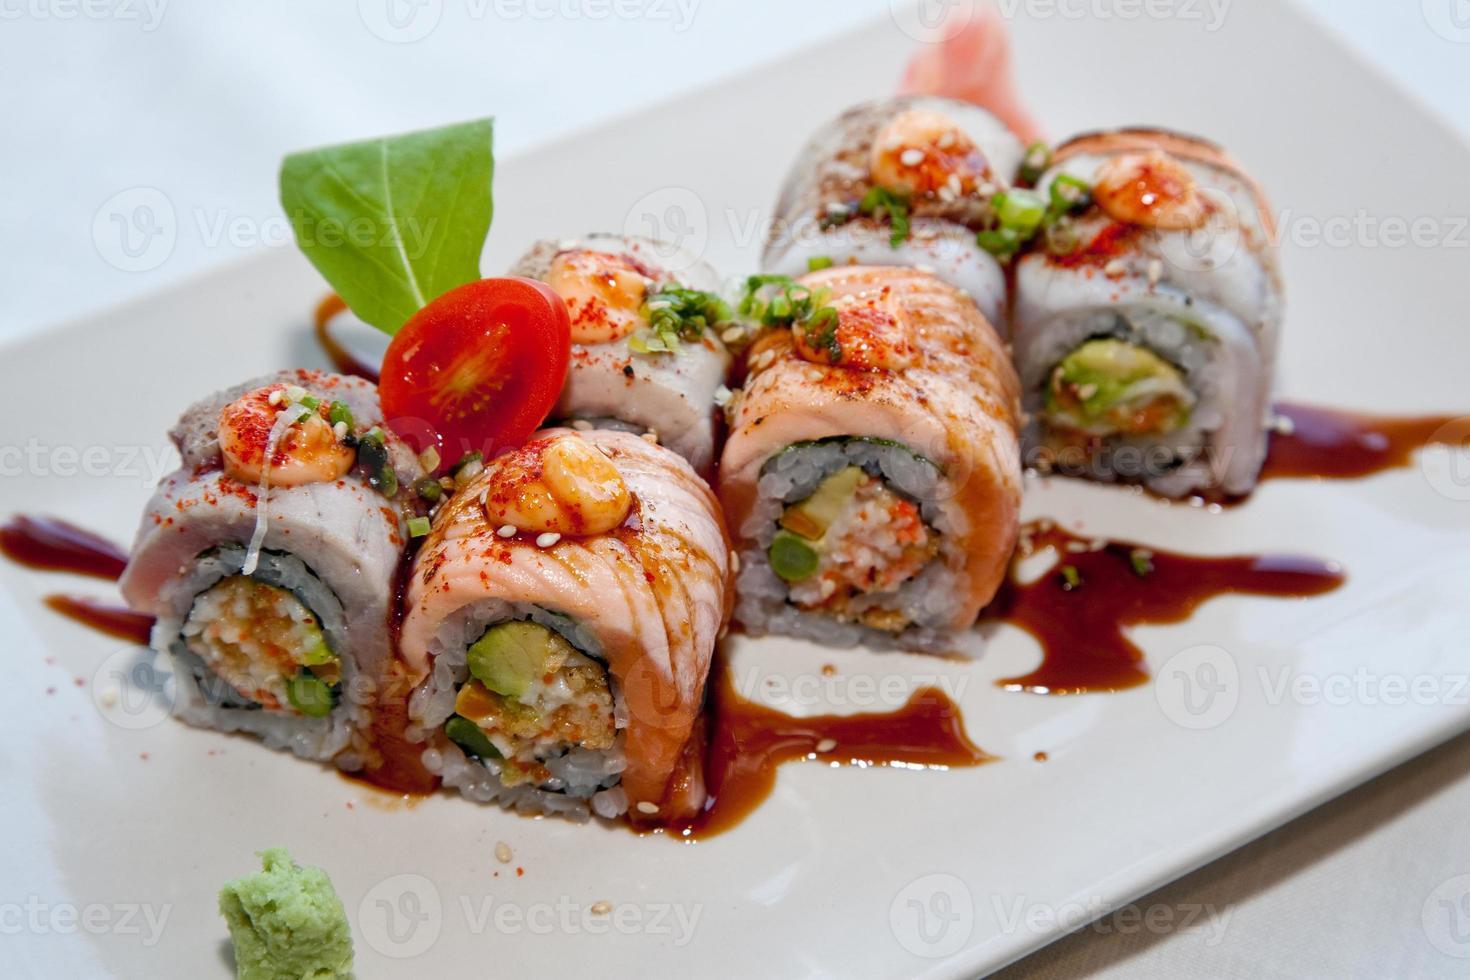 japanische Fusionsnahrungsmittel foto